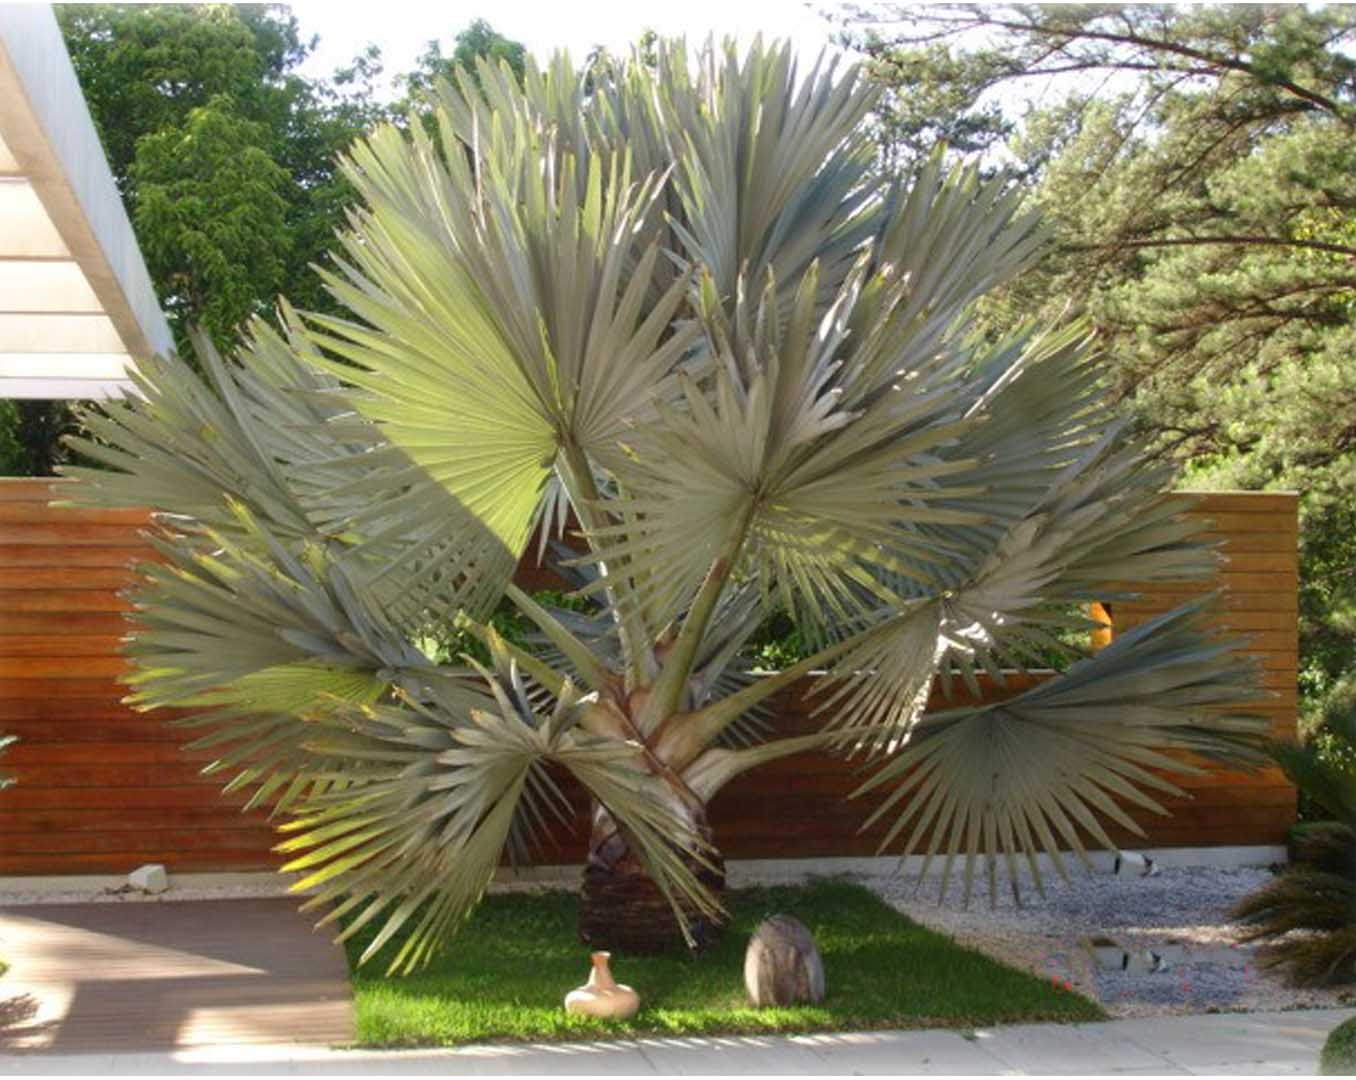 plantas jardim externo : plantas jardim externo:Tipos de plantas para jardim externo